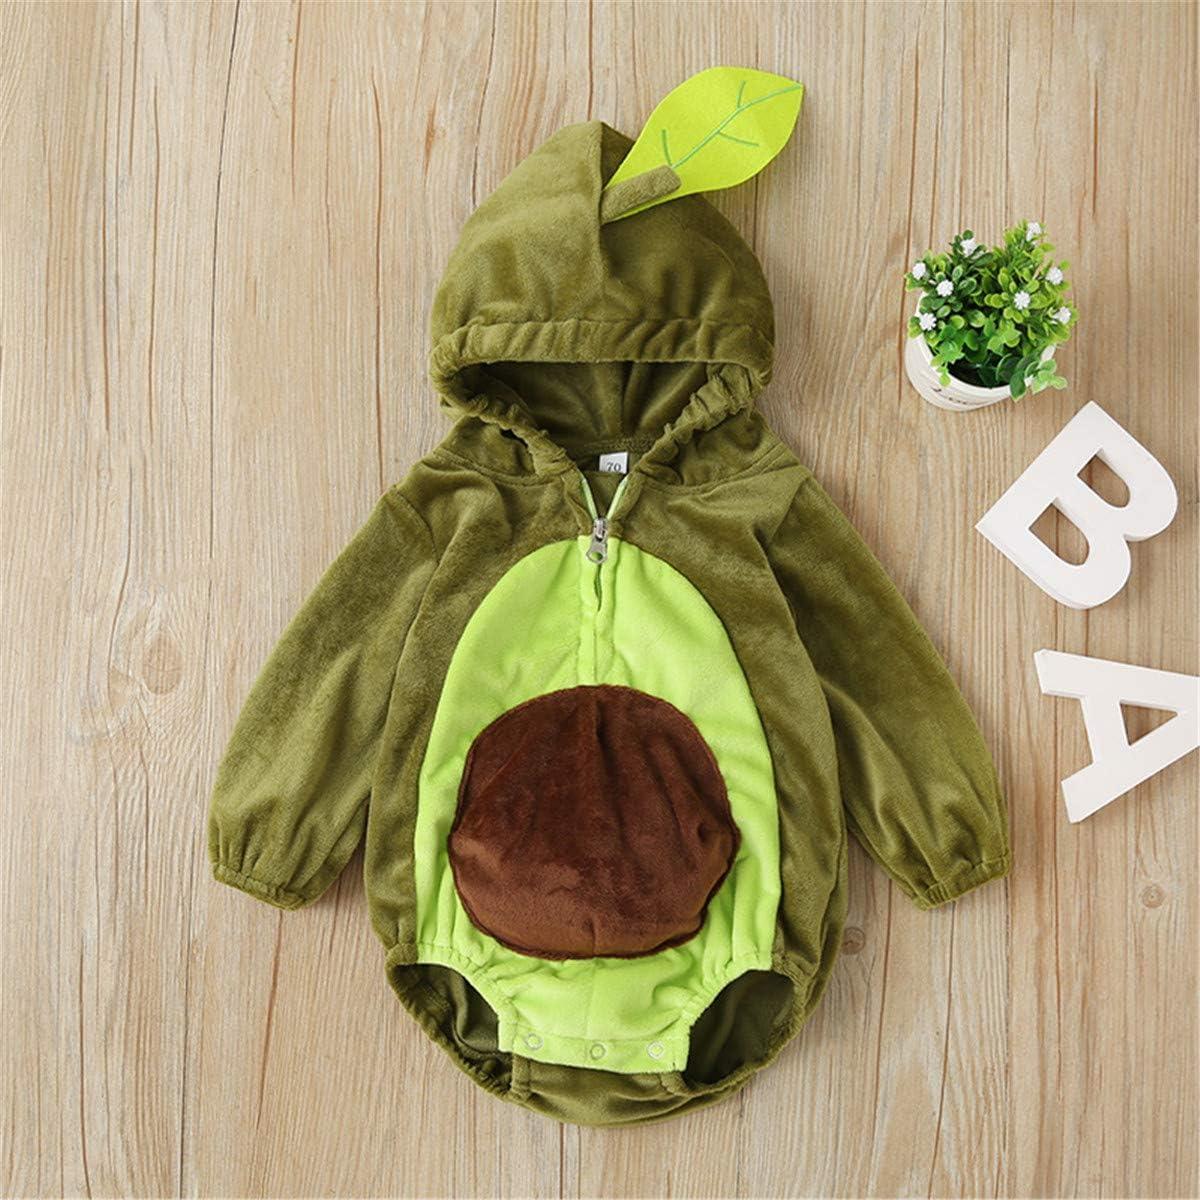 bebeshopdelageyhu Infant Toddler Baby Halloween Costumes Cute Hoodie Romper Jumpsuit Warm Costume Clothes